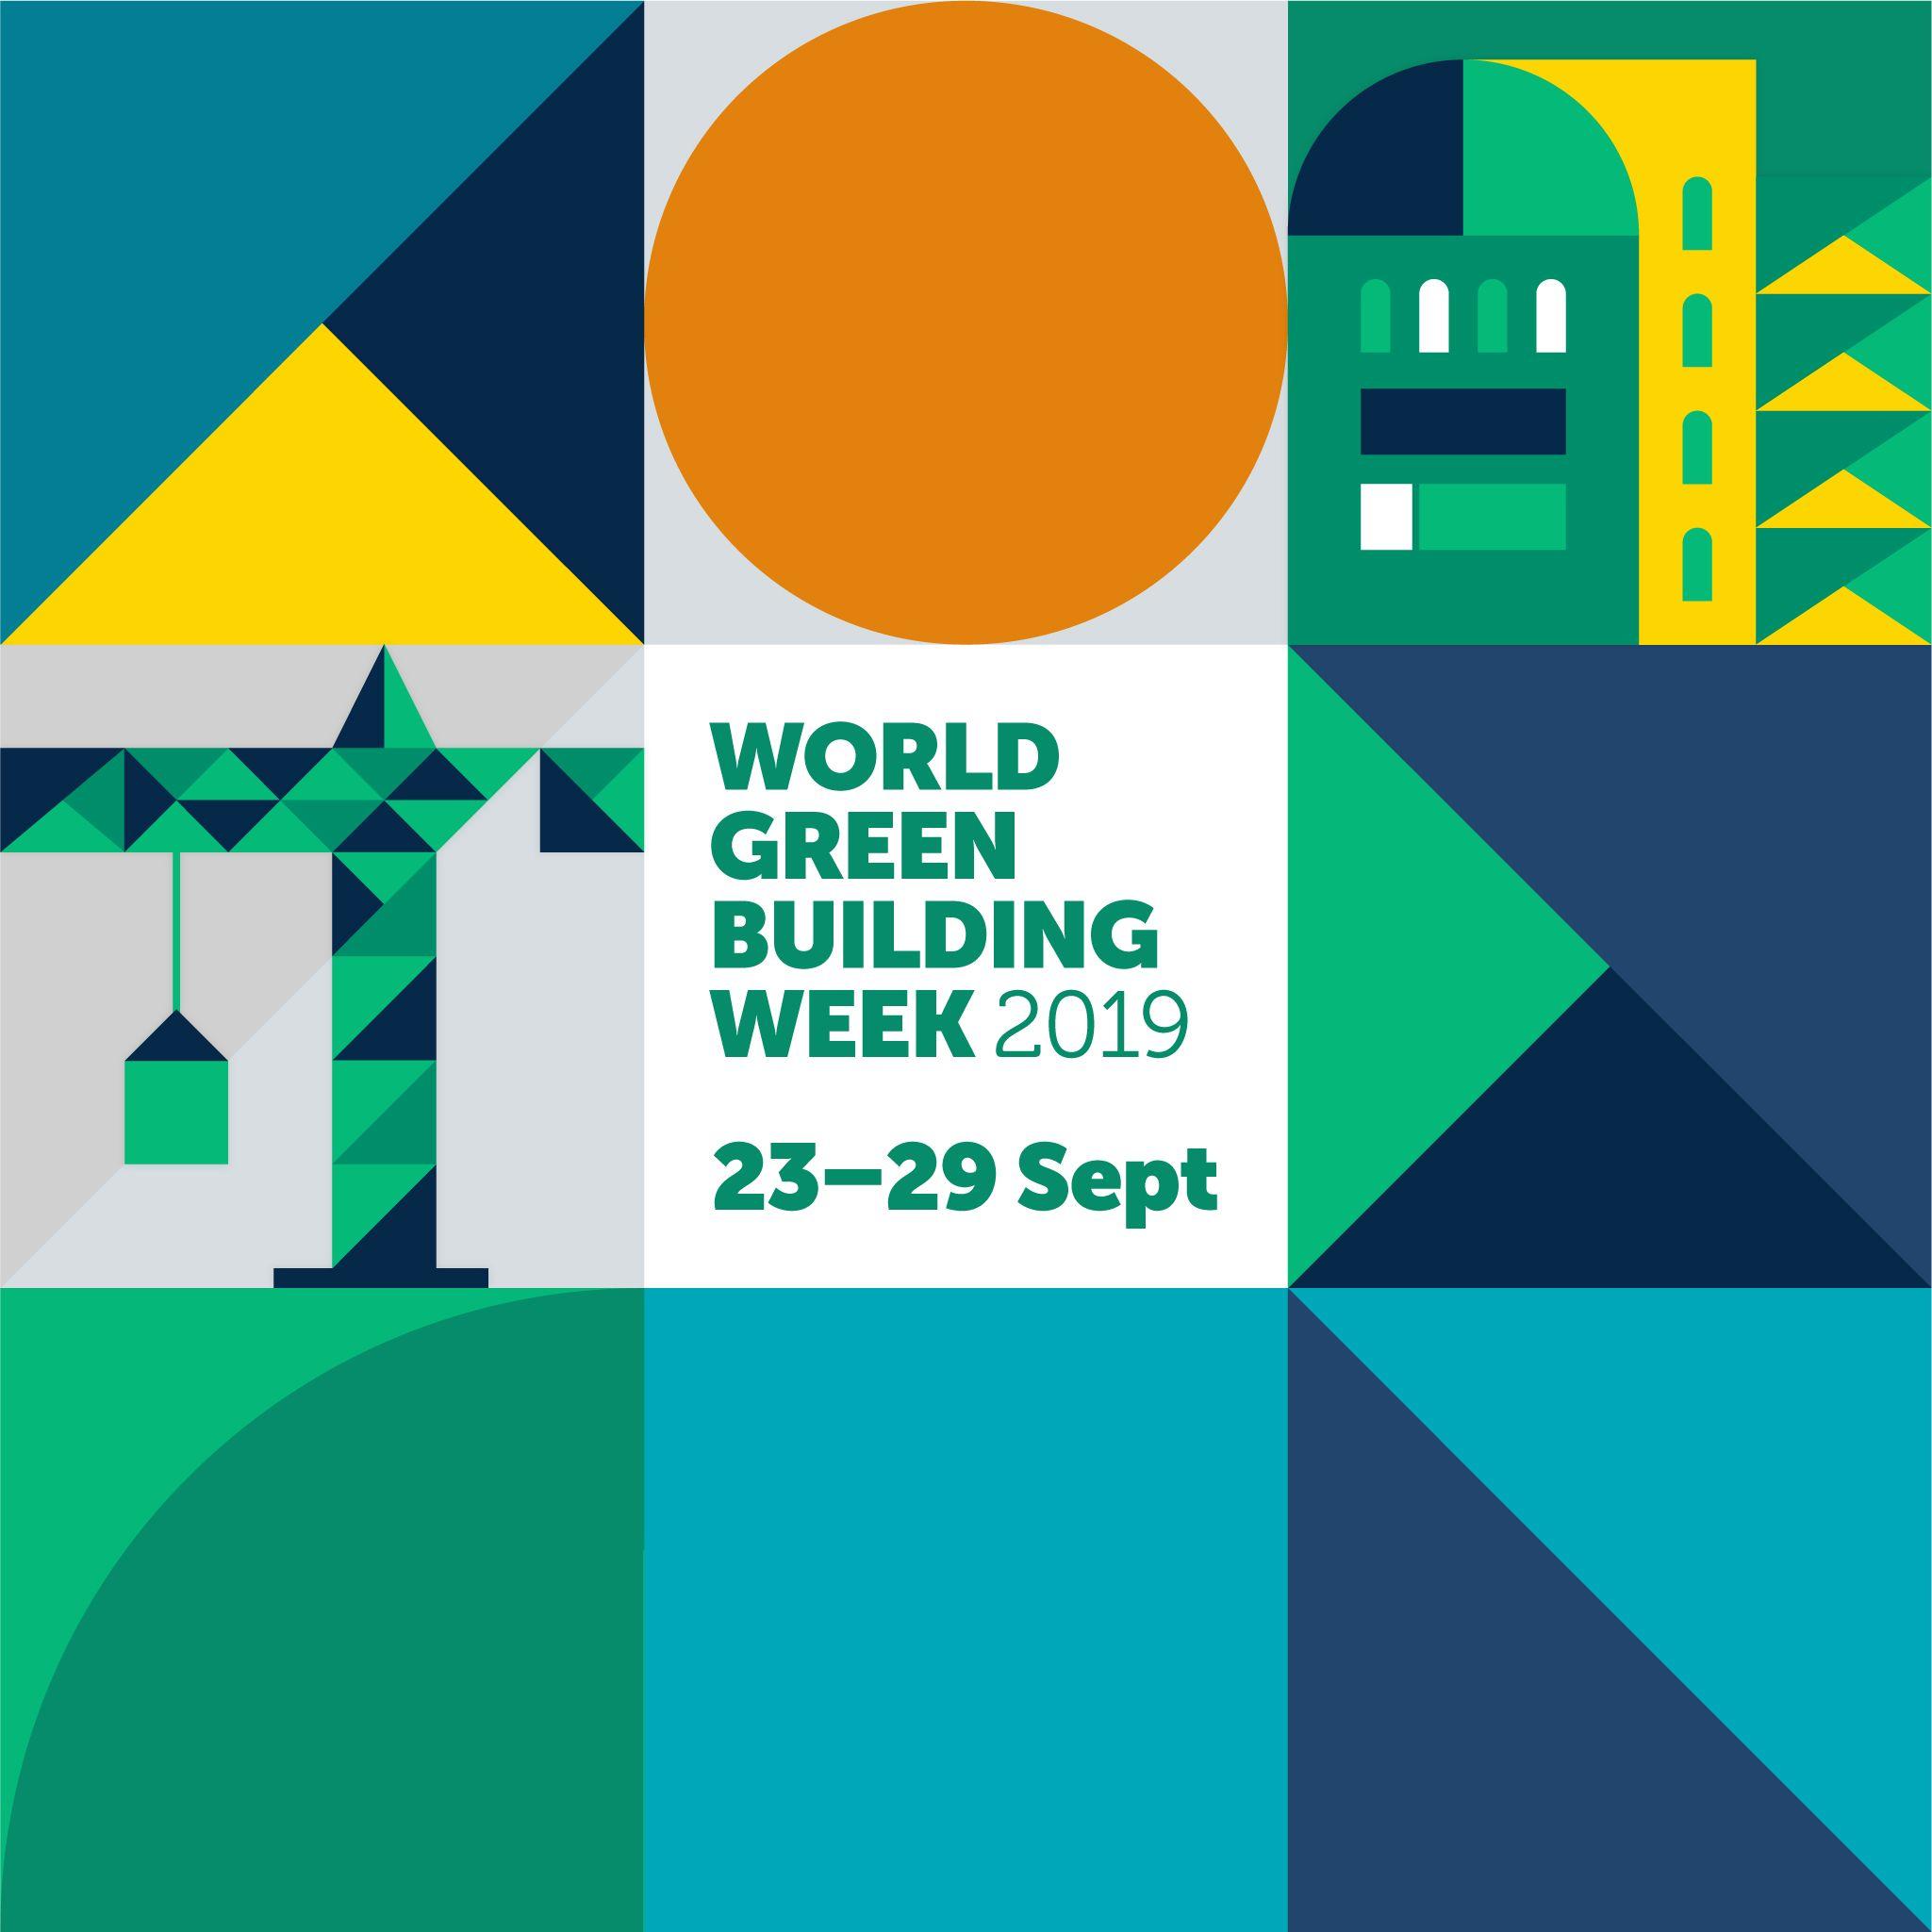 World Green Building Week 2019: #BuildingLife